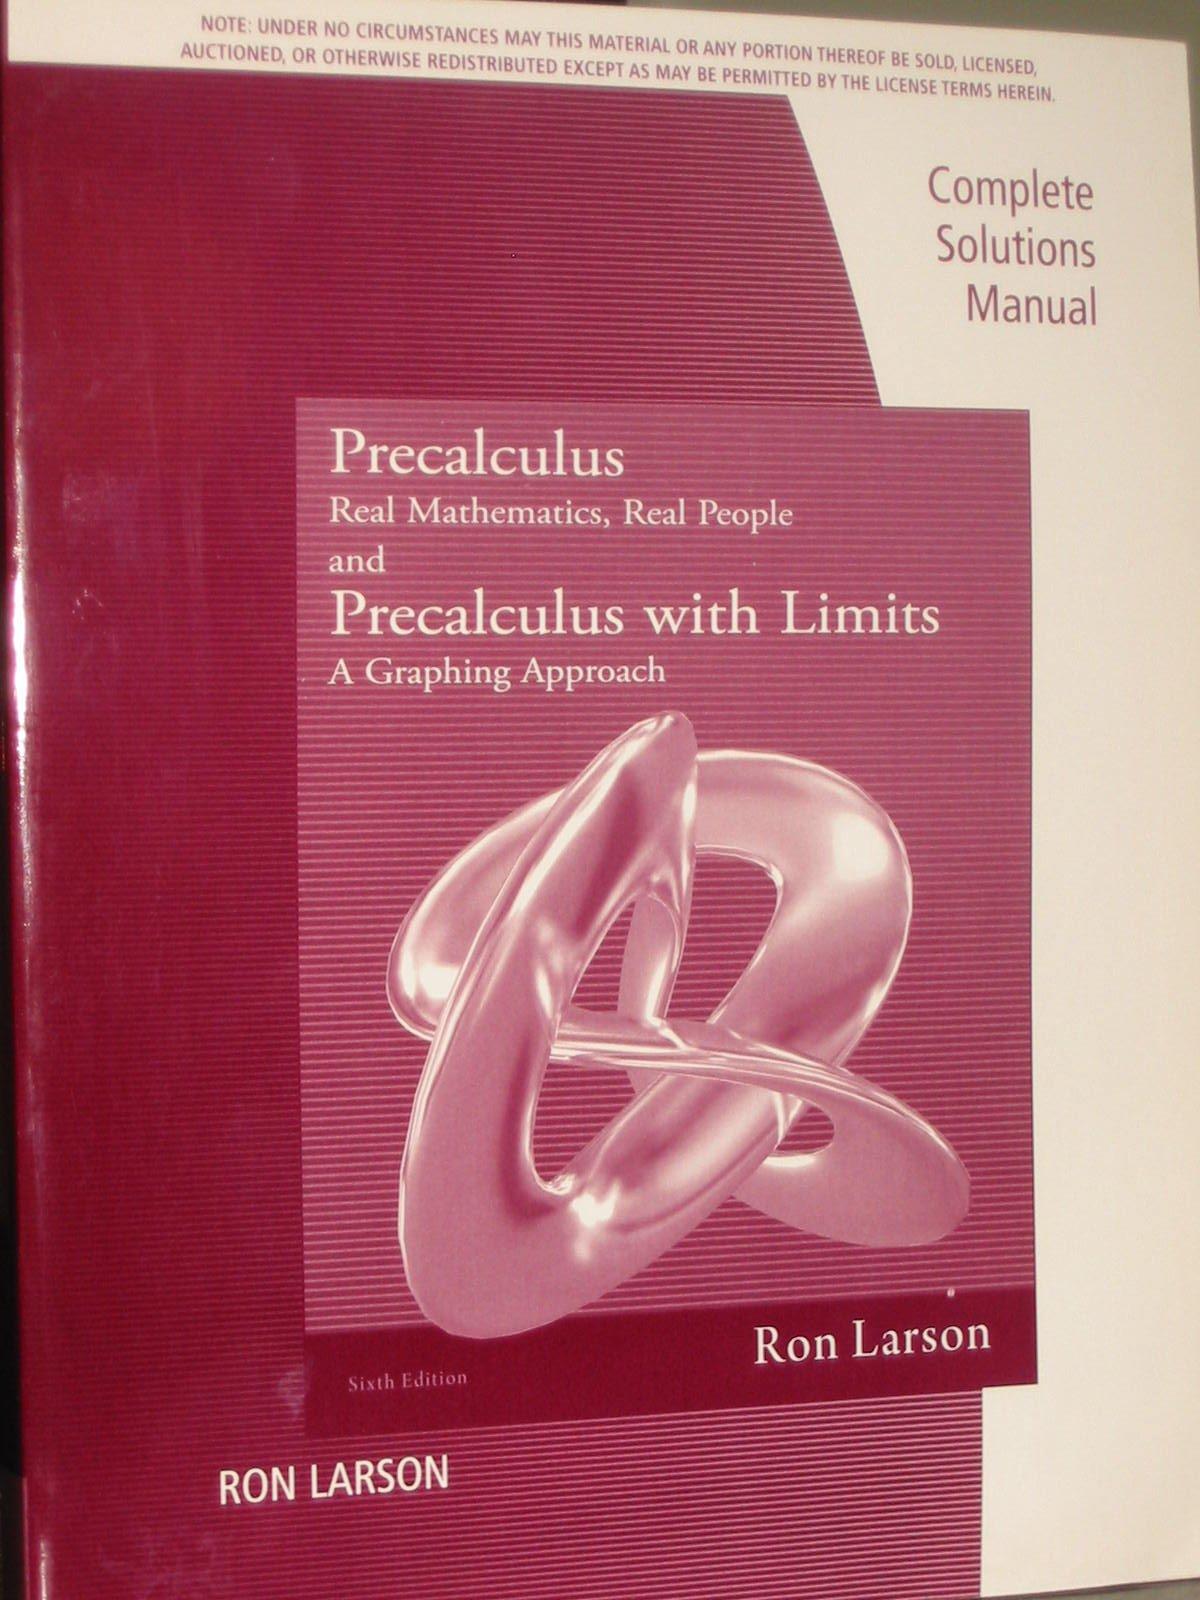 Cs Gd Precalculus Real Mathematics Real: Amazon.co.uk: Larson Larson:  9781111574024: Books